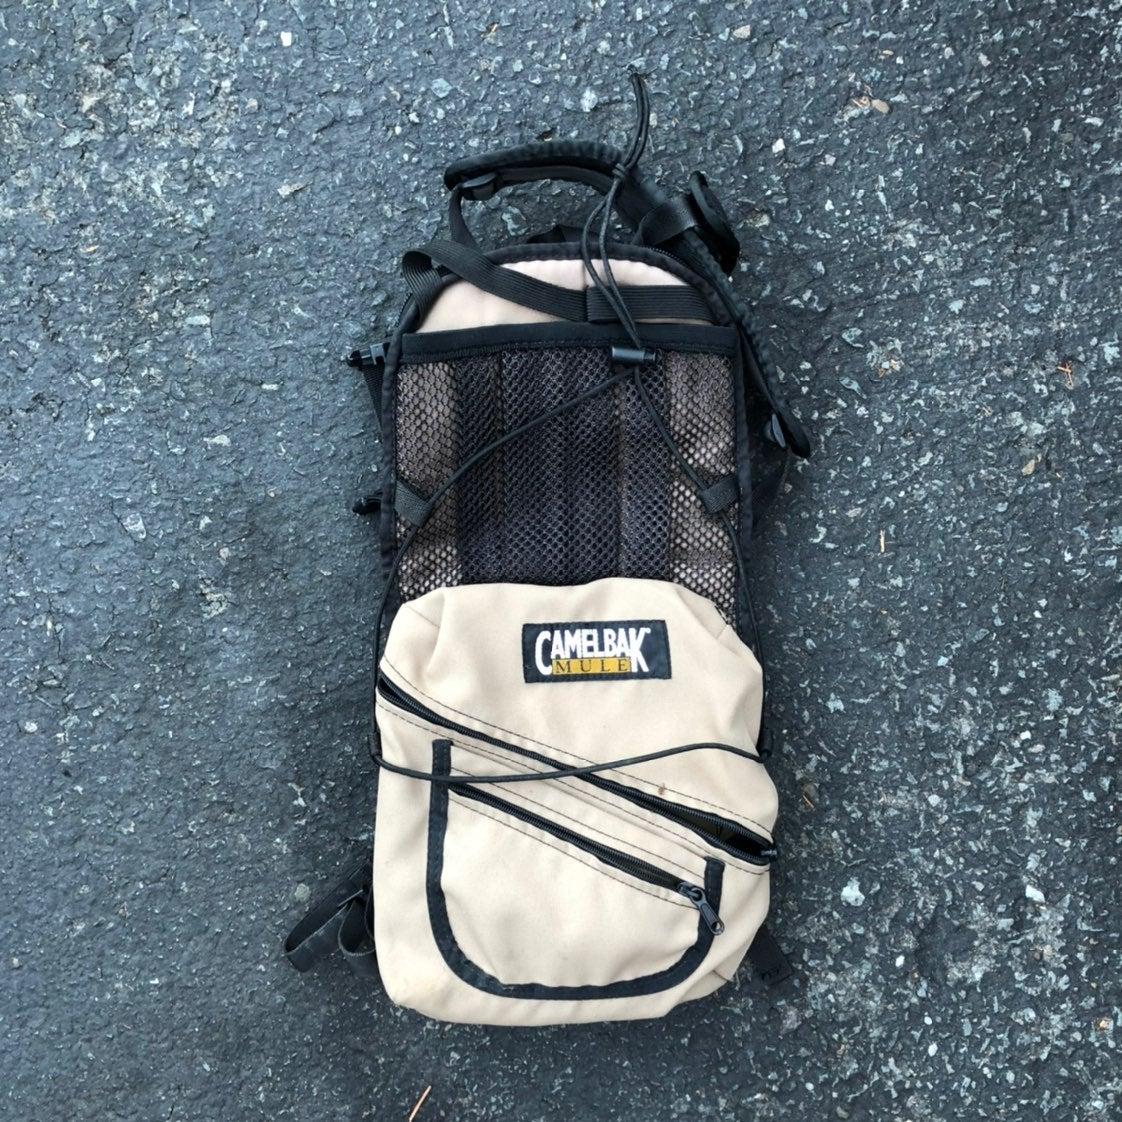 CamelBak Mule Hydration Backpack